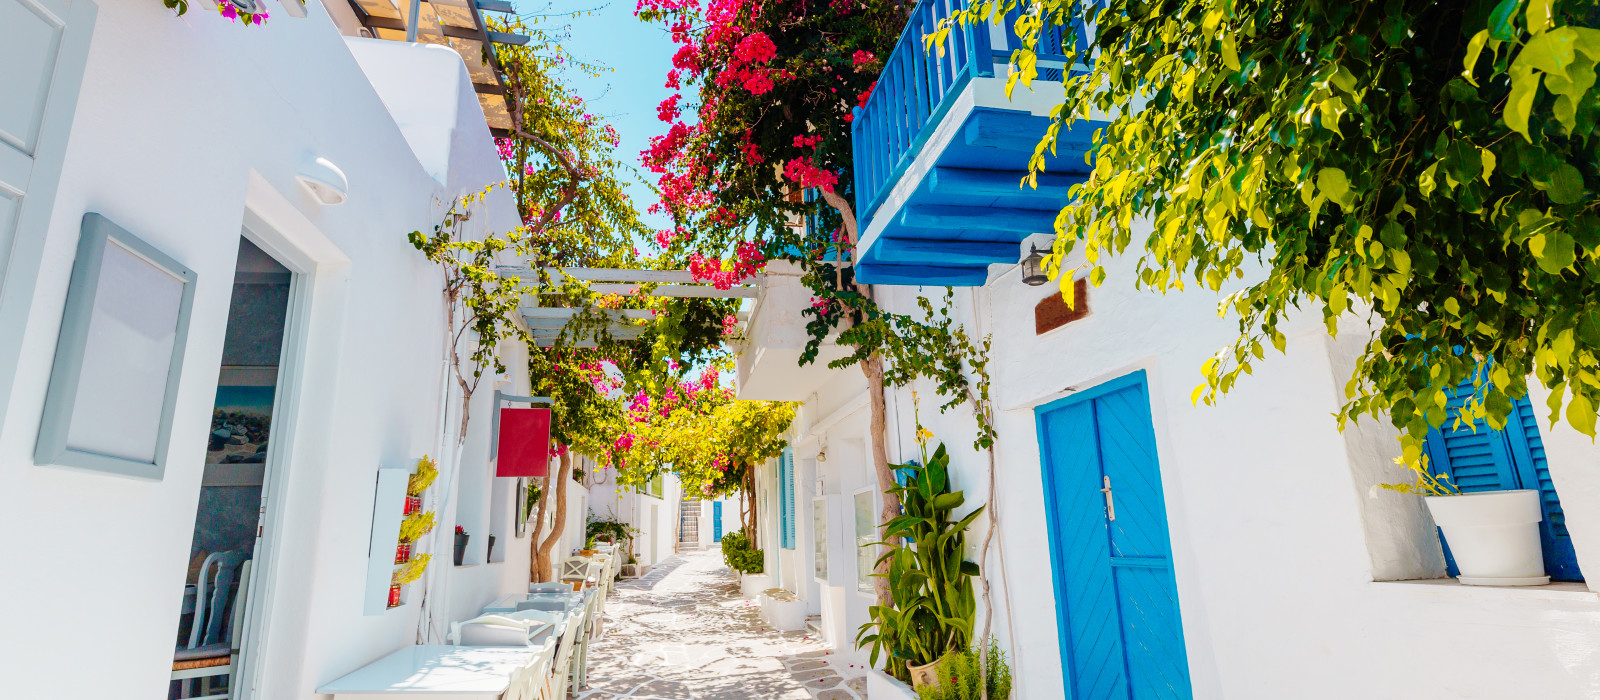 Destination Paros Greece